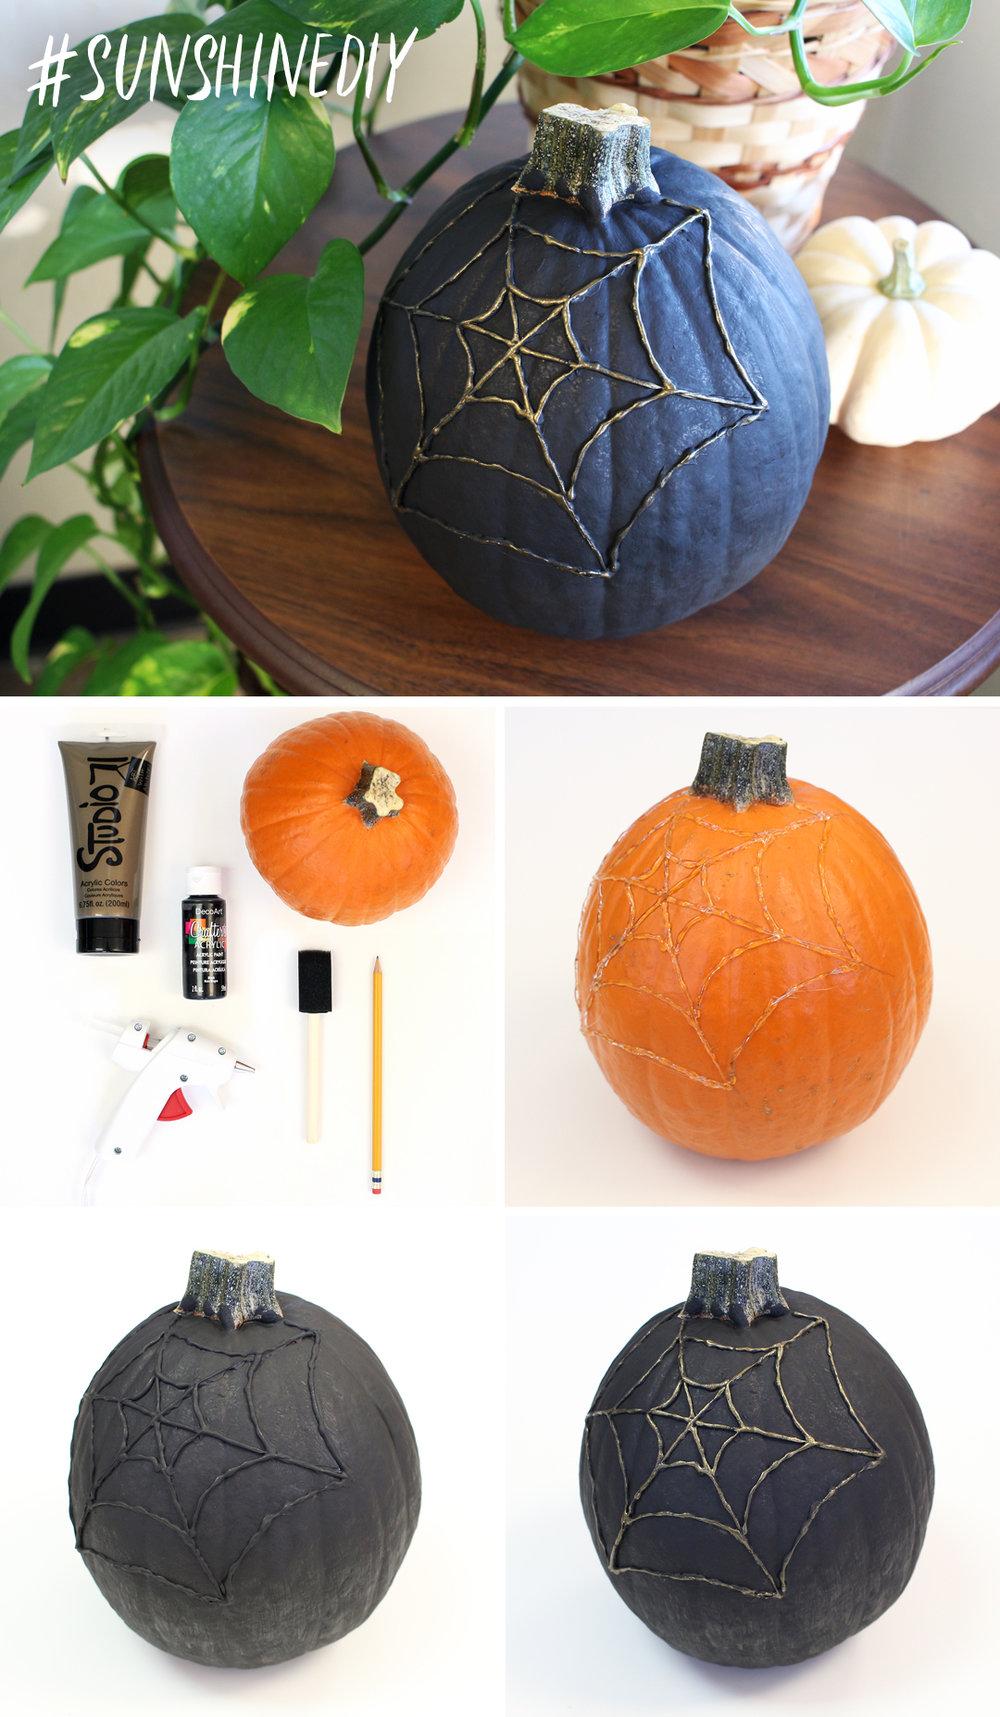 Spider-Web-Pumpkin-DIY-8.jpg